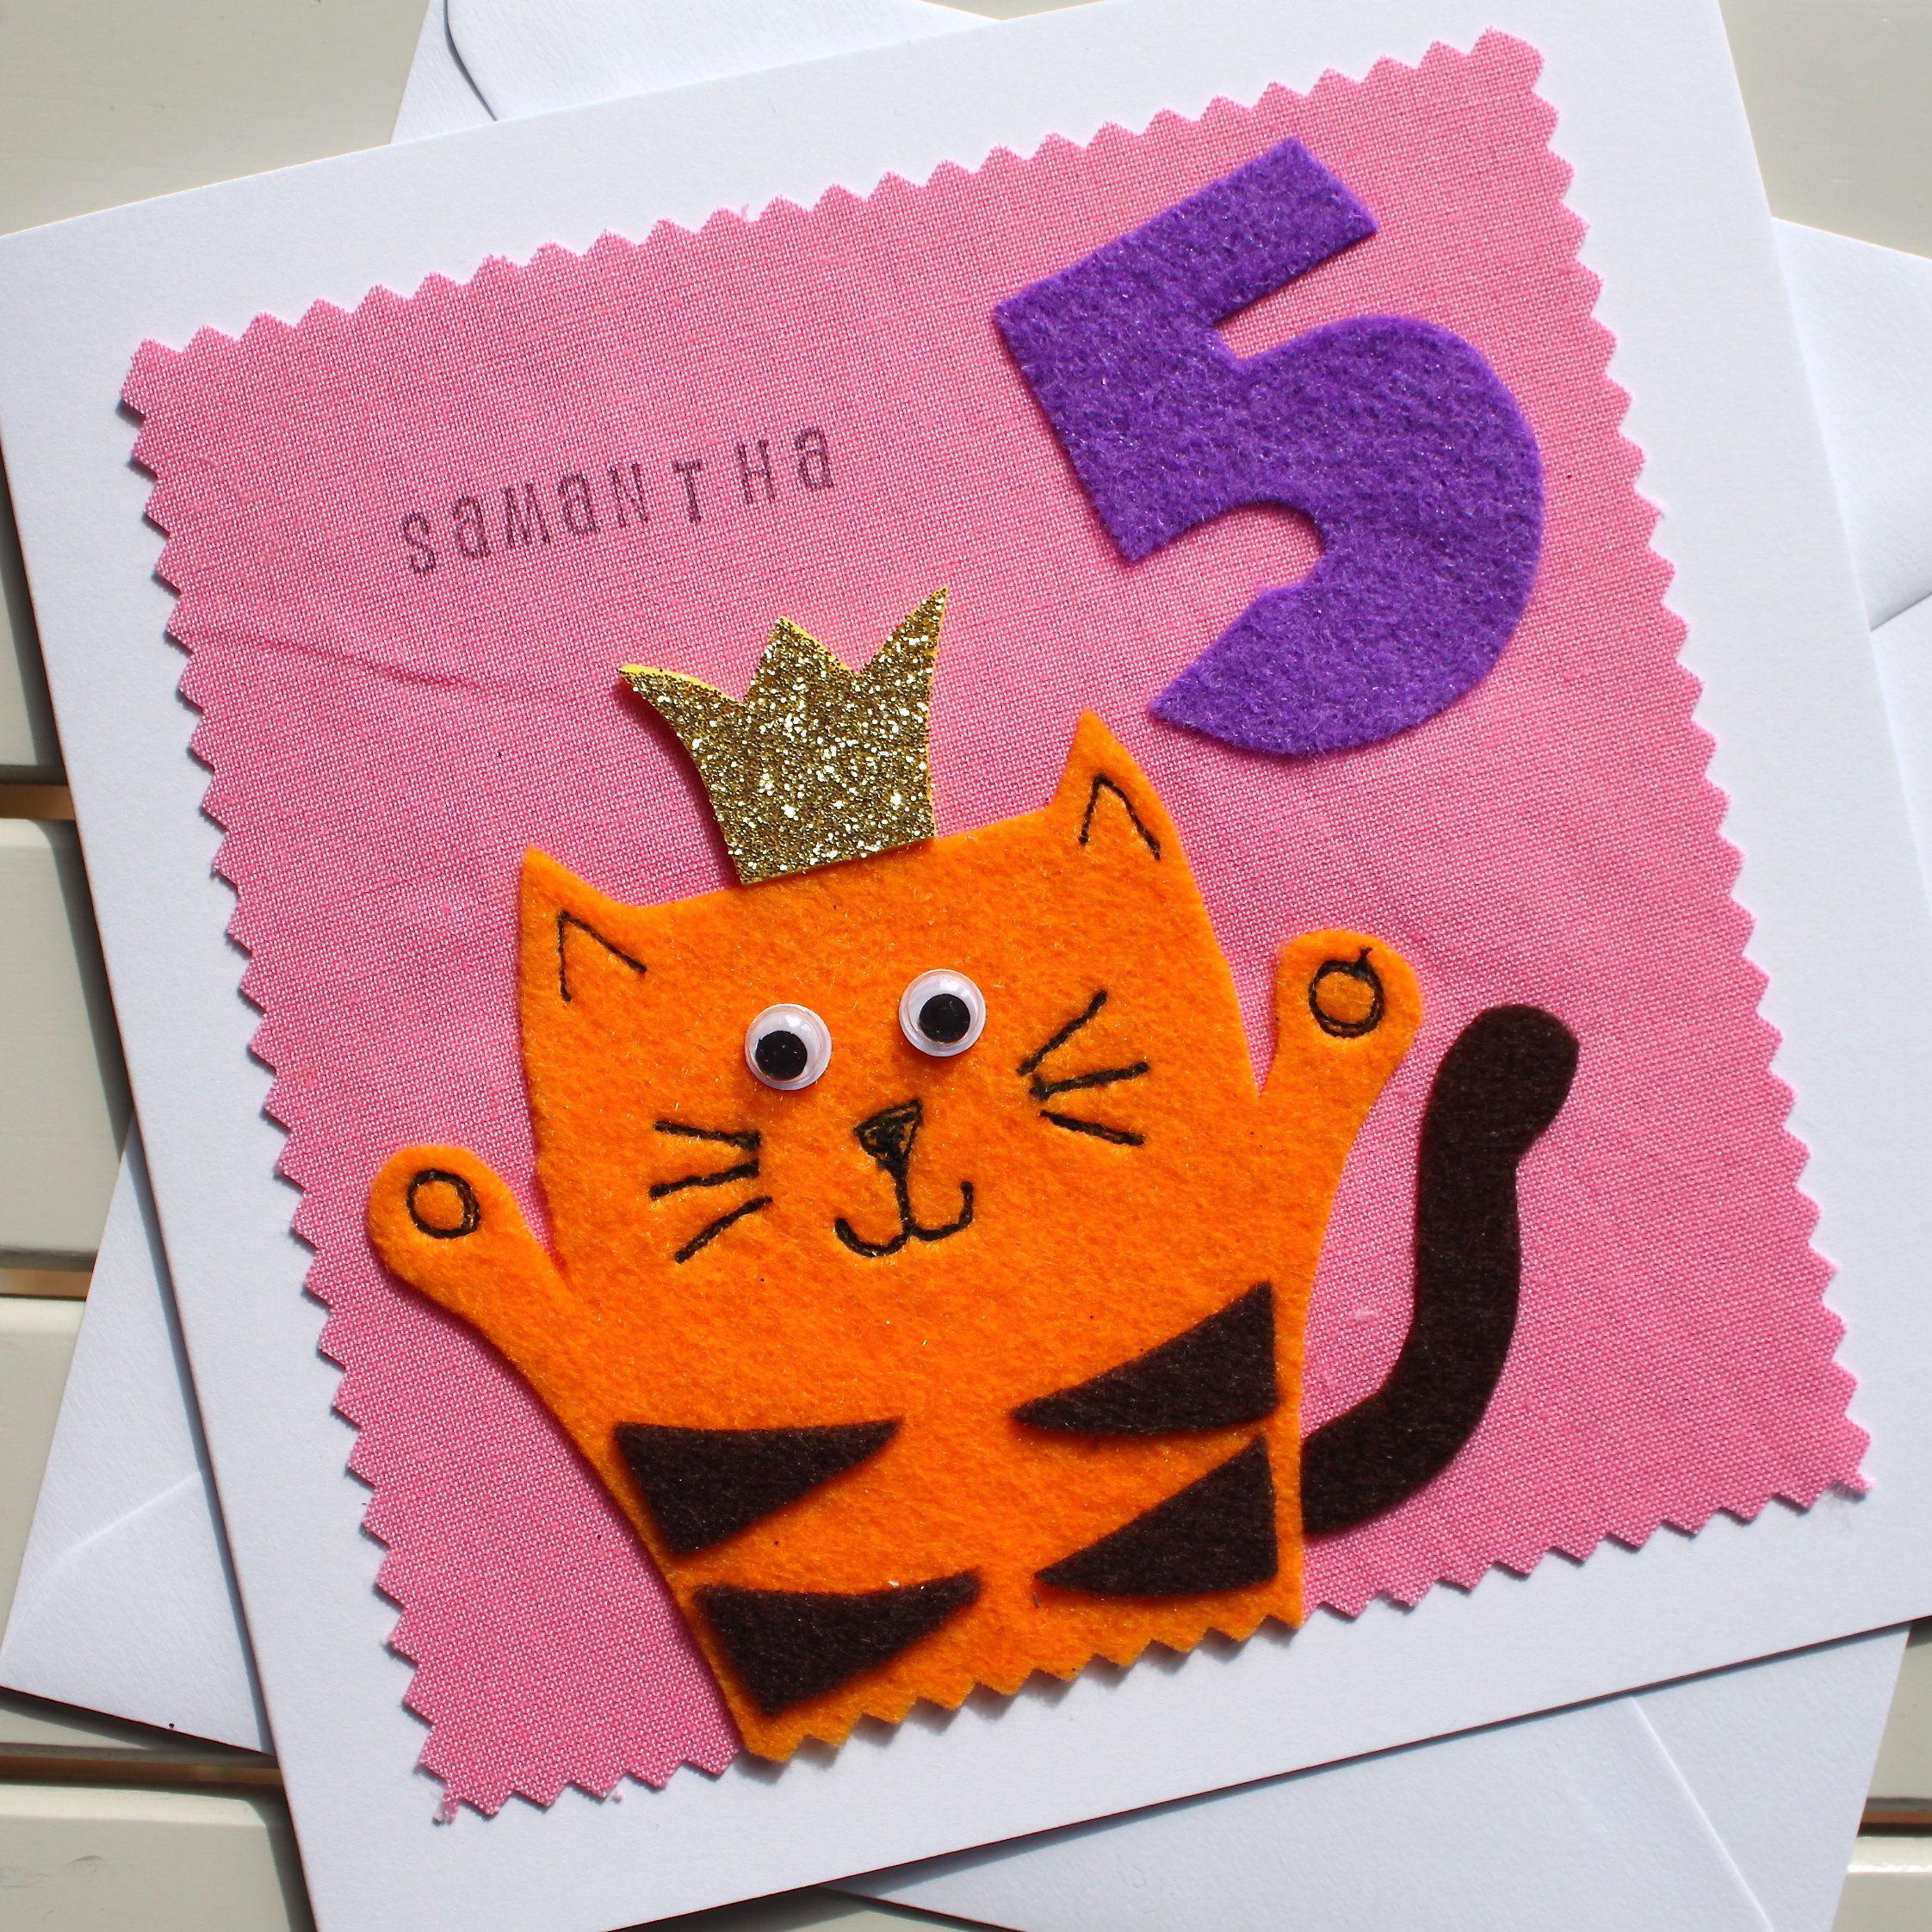 Ginger Cat Childrens Birthday Card Handmade Felt And Fabric Etsy Fabric Cards Handmade Birthday Cards Birthday Cards